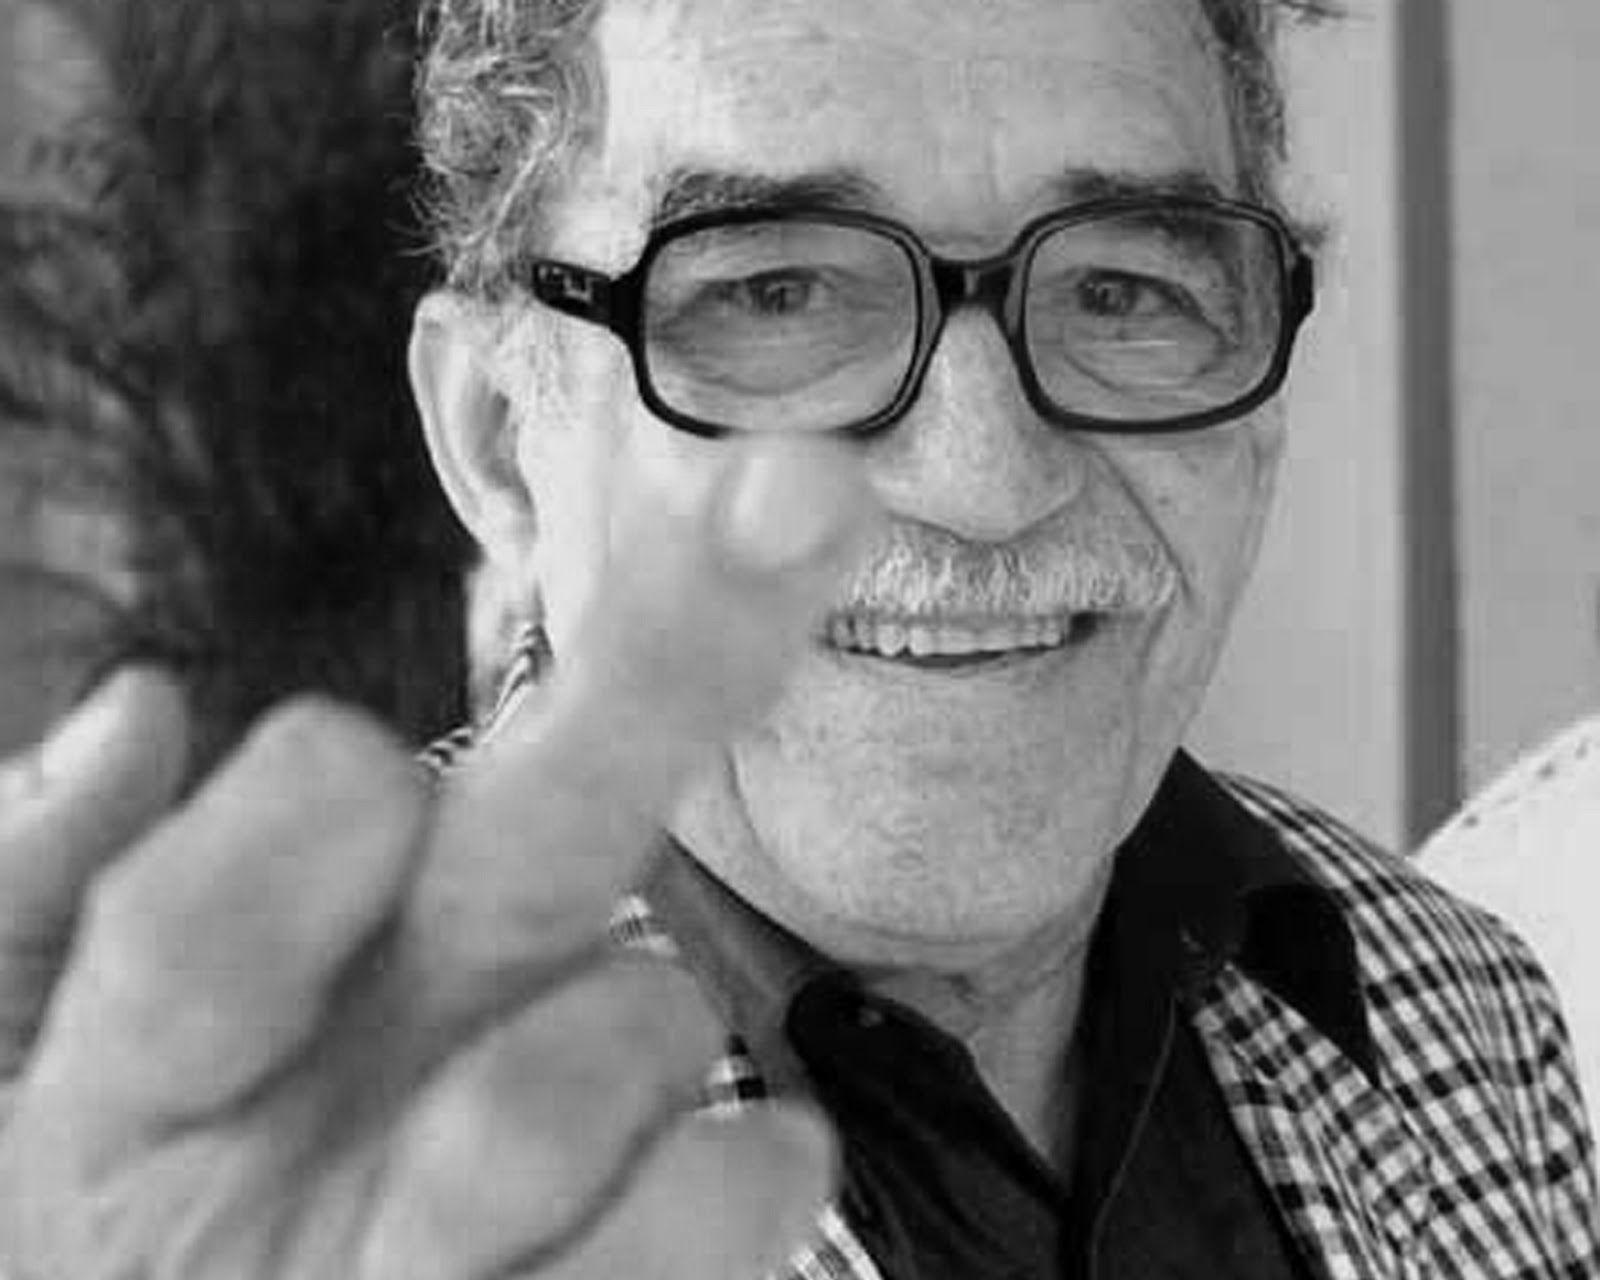 White apron sergio vodanovic english - 1000 Images About Autores Novelistas Poetas On Pinterest Gabriel Garcia Marquez Harper Lee And Charlotte Bronte